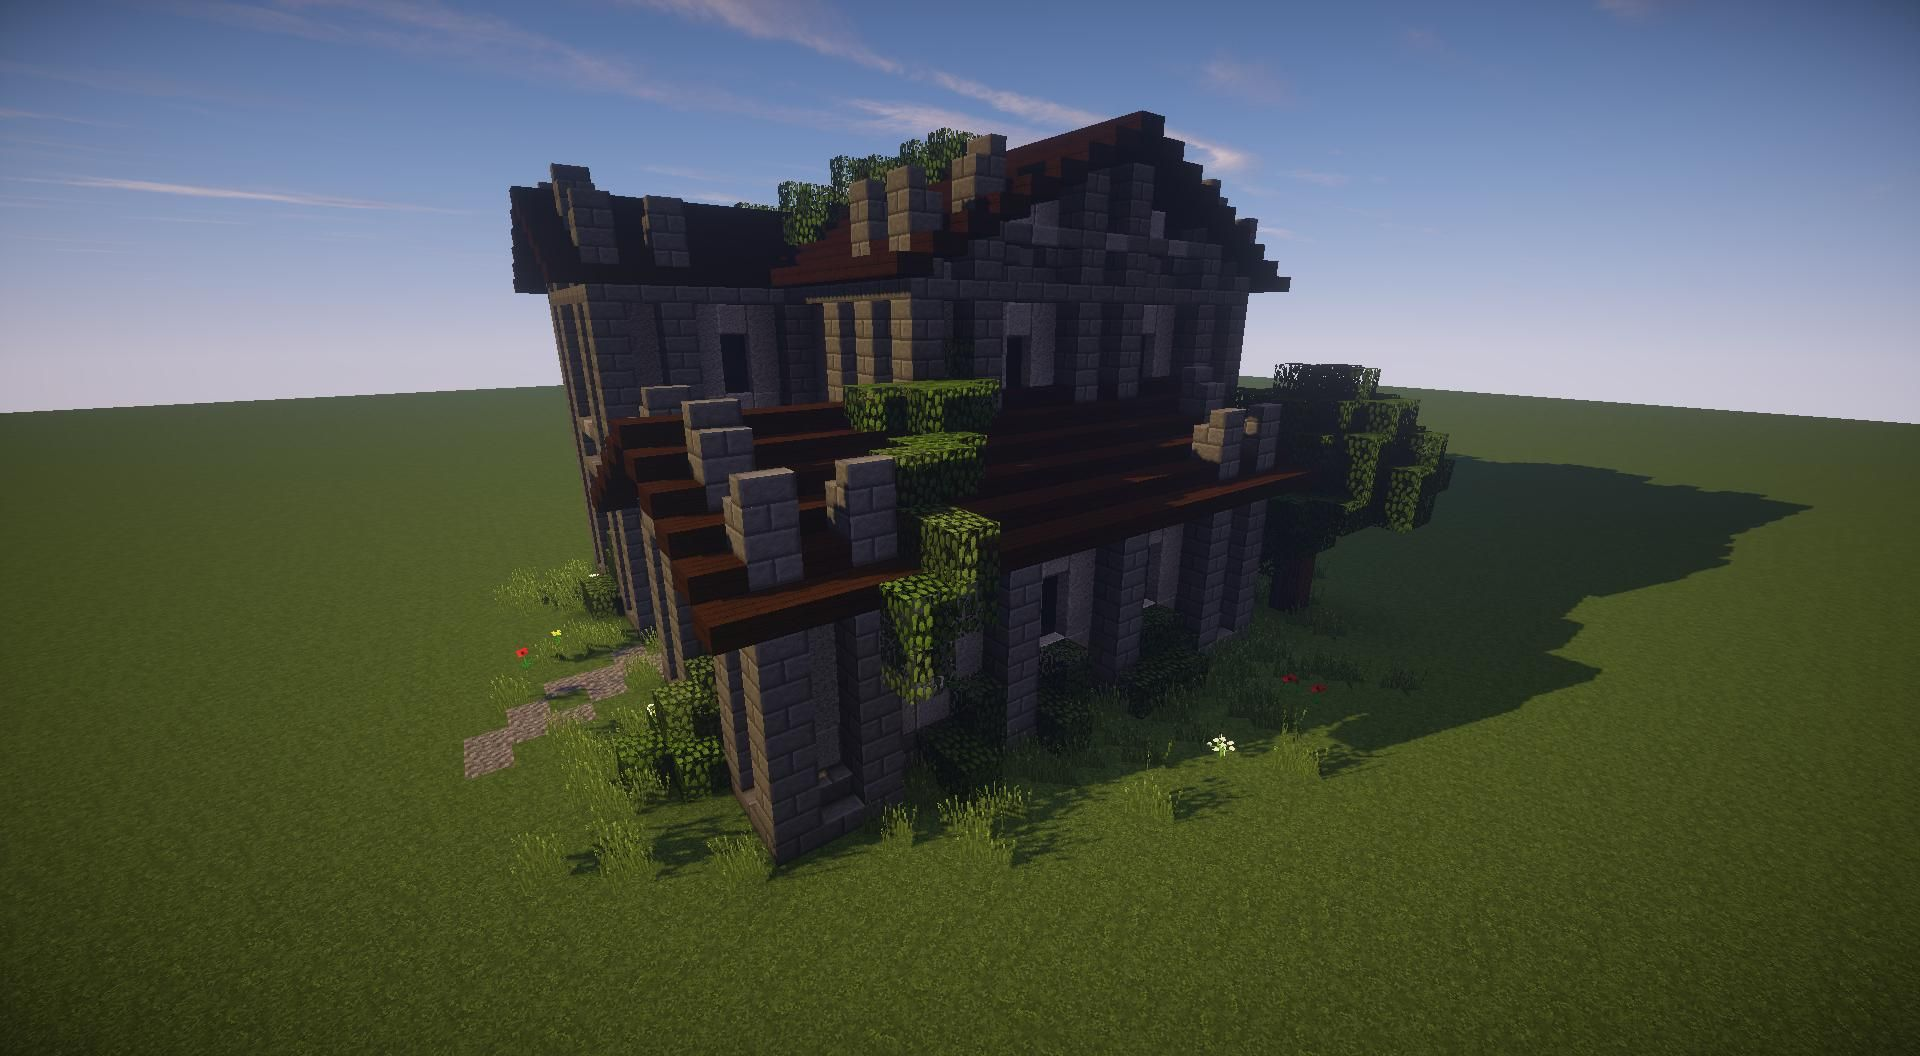 Anyfxet Jpg 1920 1056 Minecraft Houses Survival Minecraft Houses Minecraft Houses Blueprints